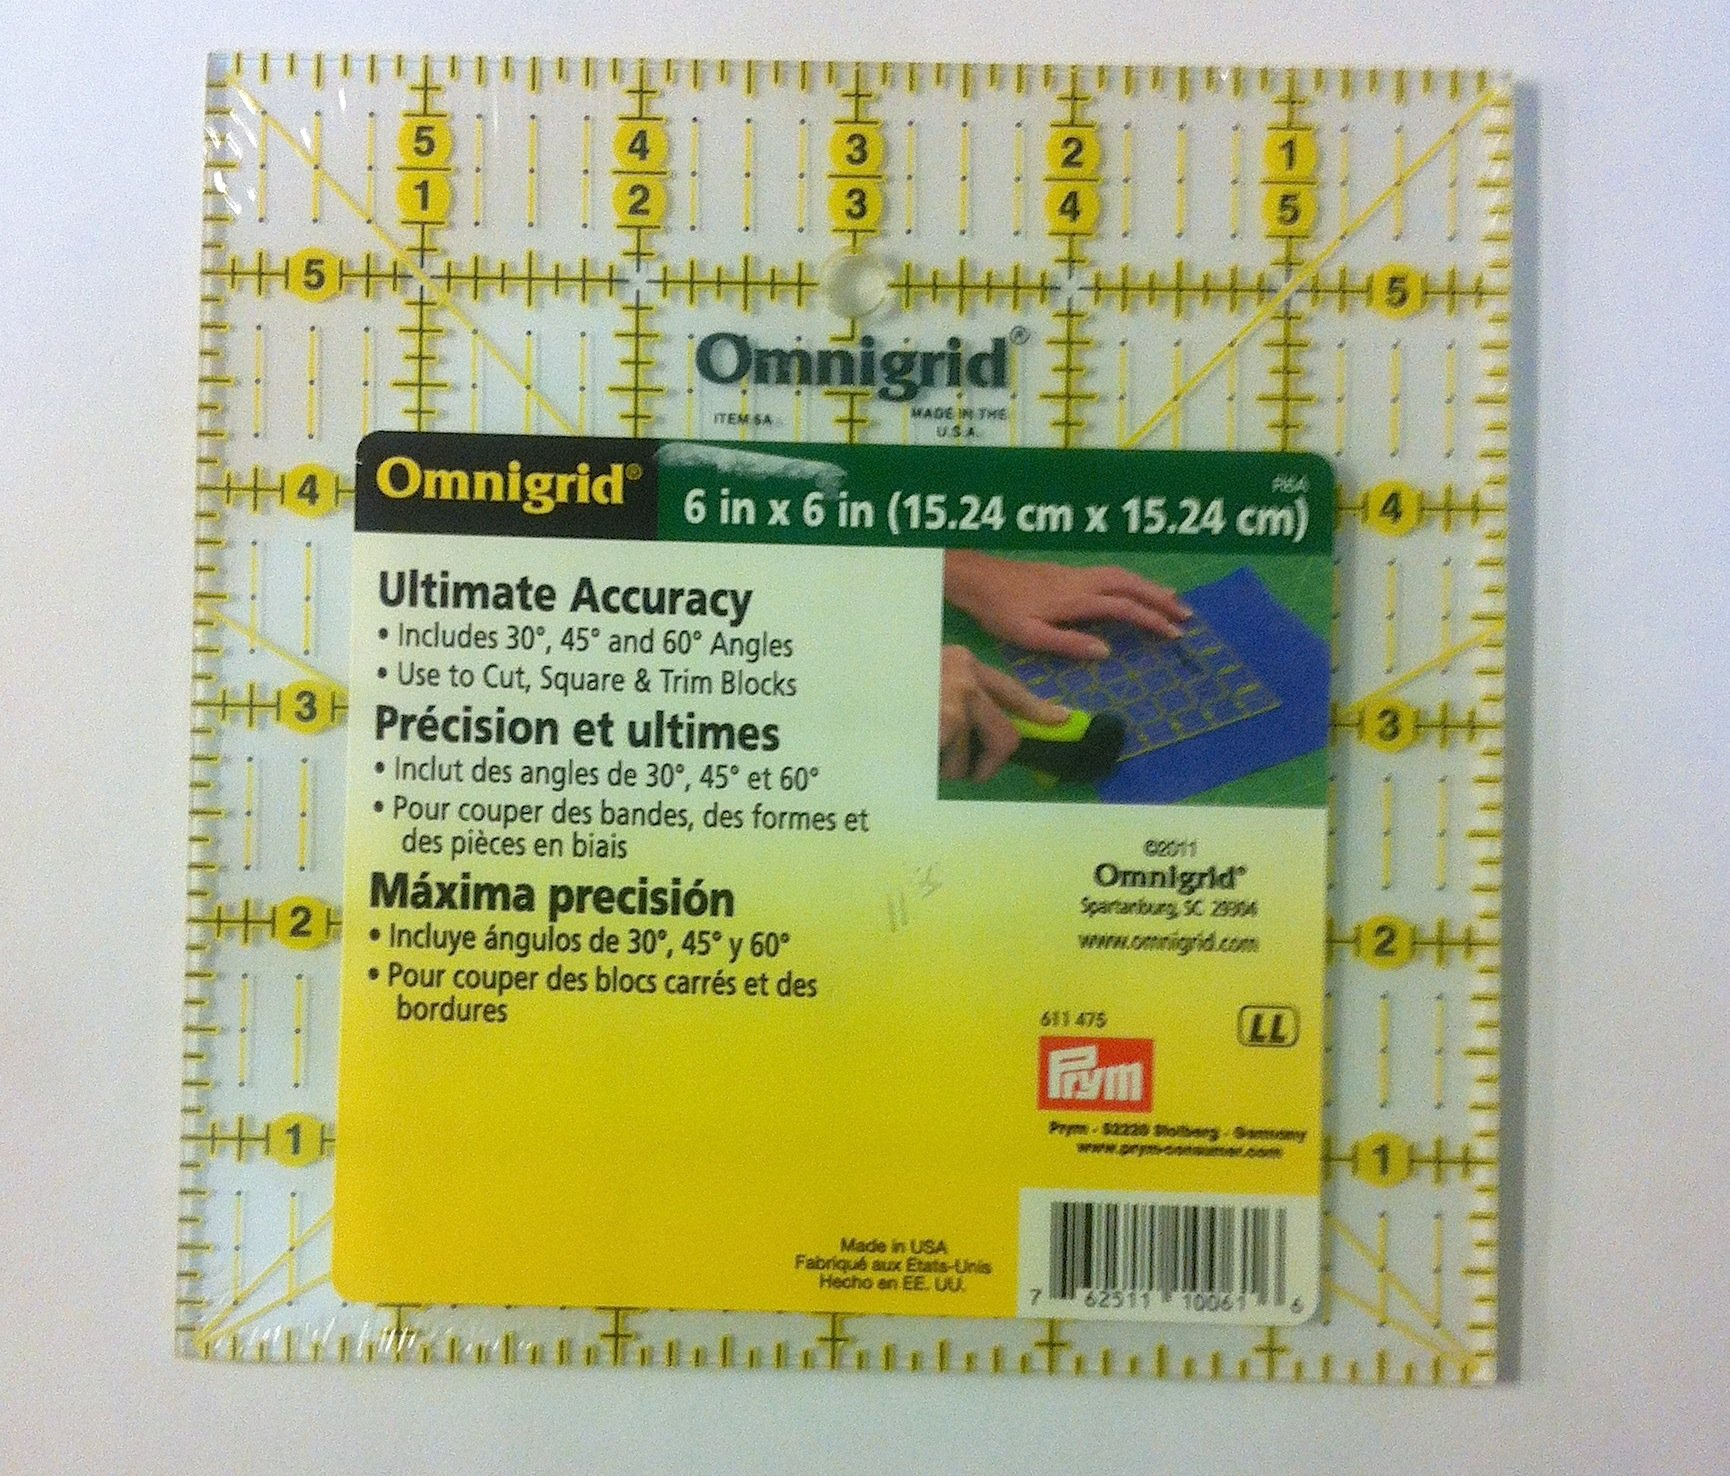 Omnigrid 6X6 in. Ruler